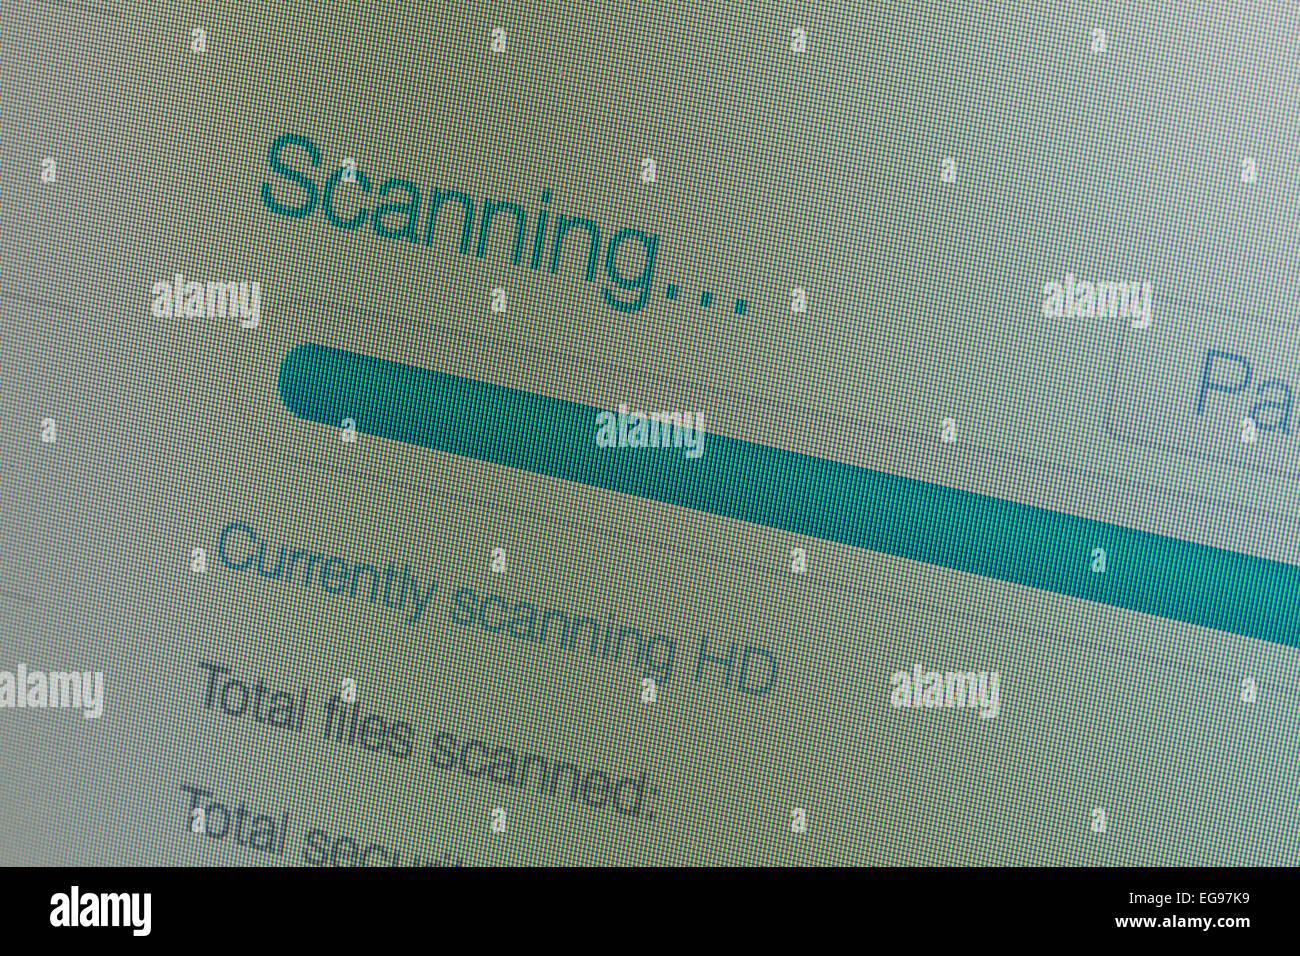 Anti-Virus Scan Nachricht auf LCD-Bildschirm Stockbild